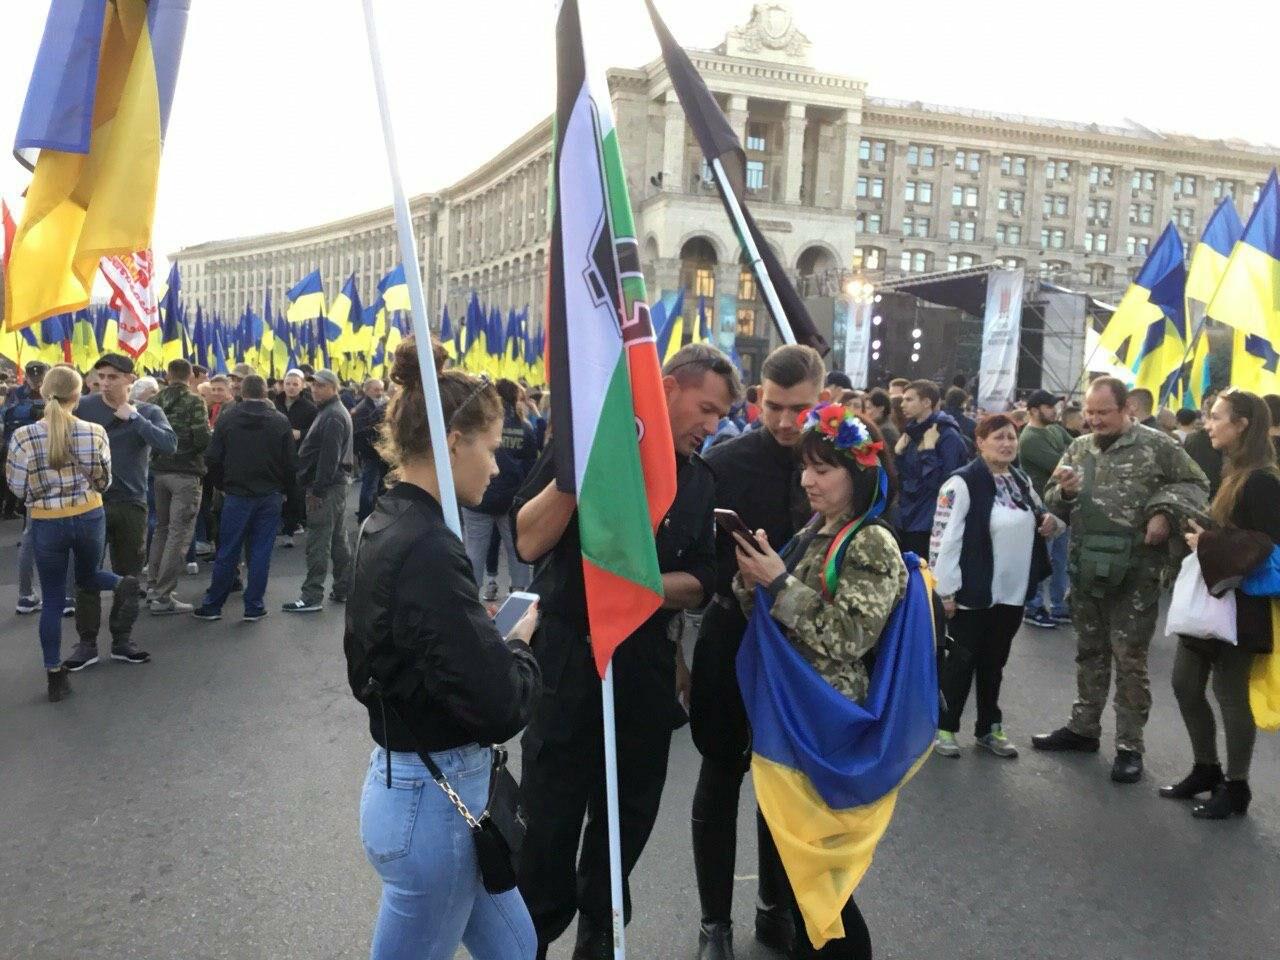 Криворожане поддержали Марш сопротивления капитуляции в Киеве, - ФОТО, ВИДЕО, ОБНОВЛЕНО, фото-36